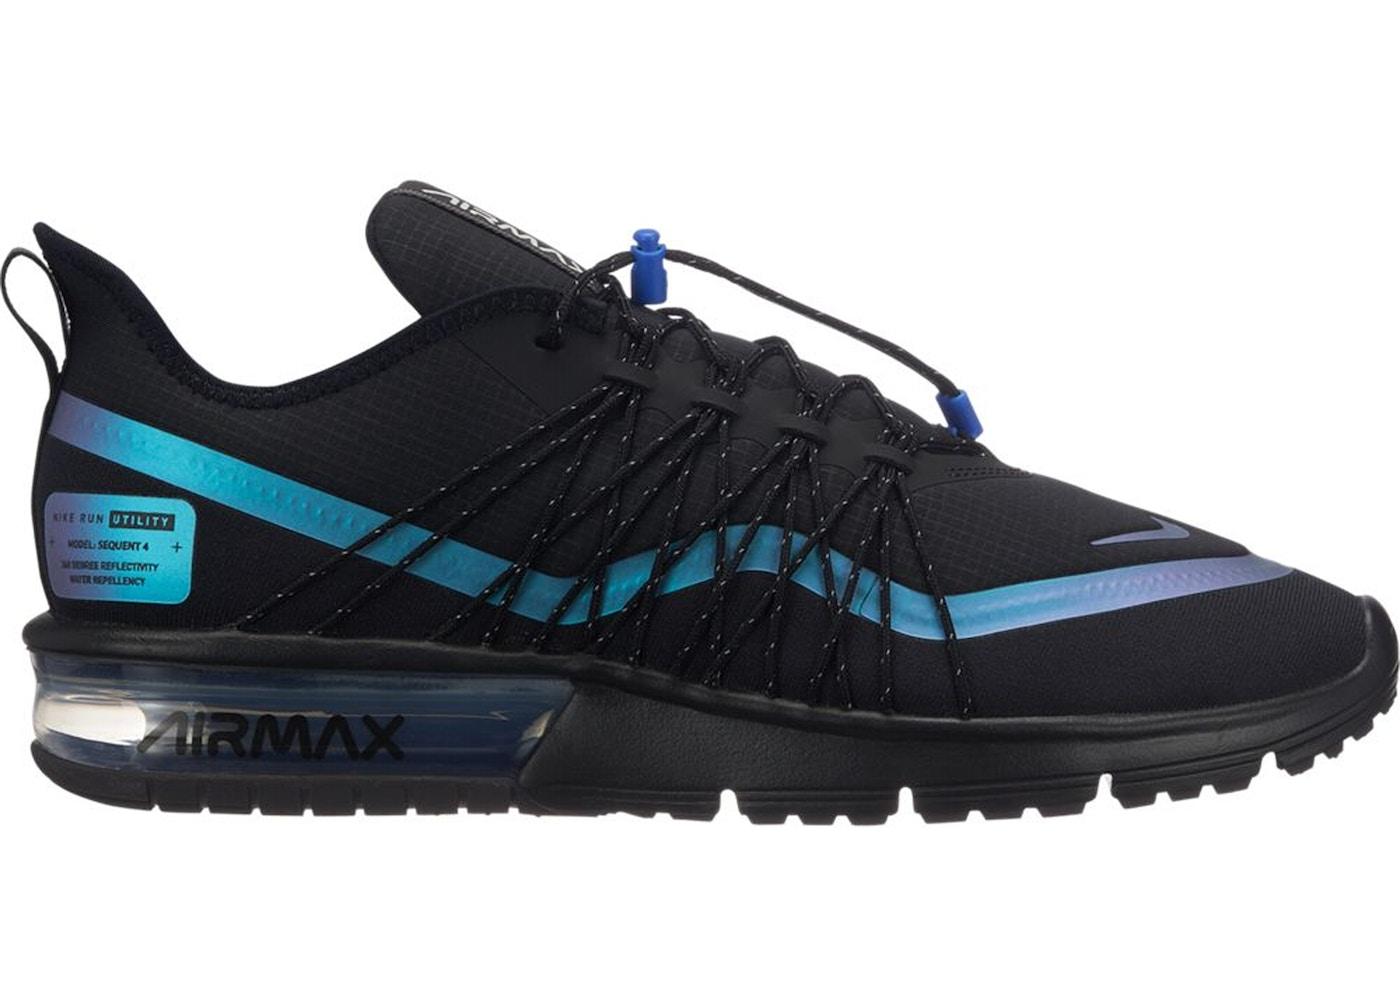 Nike Air Max Sequent 4 Utility Throwback Future